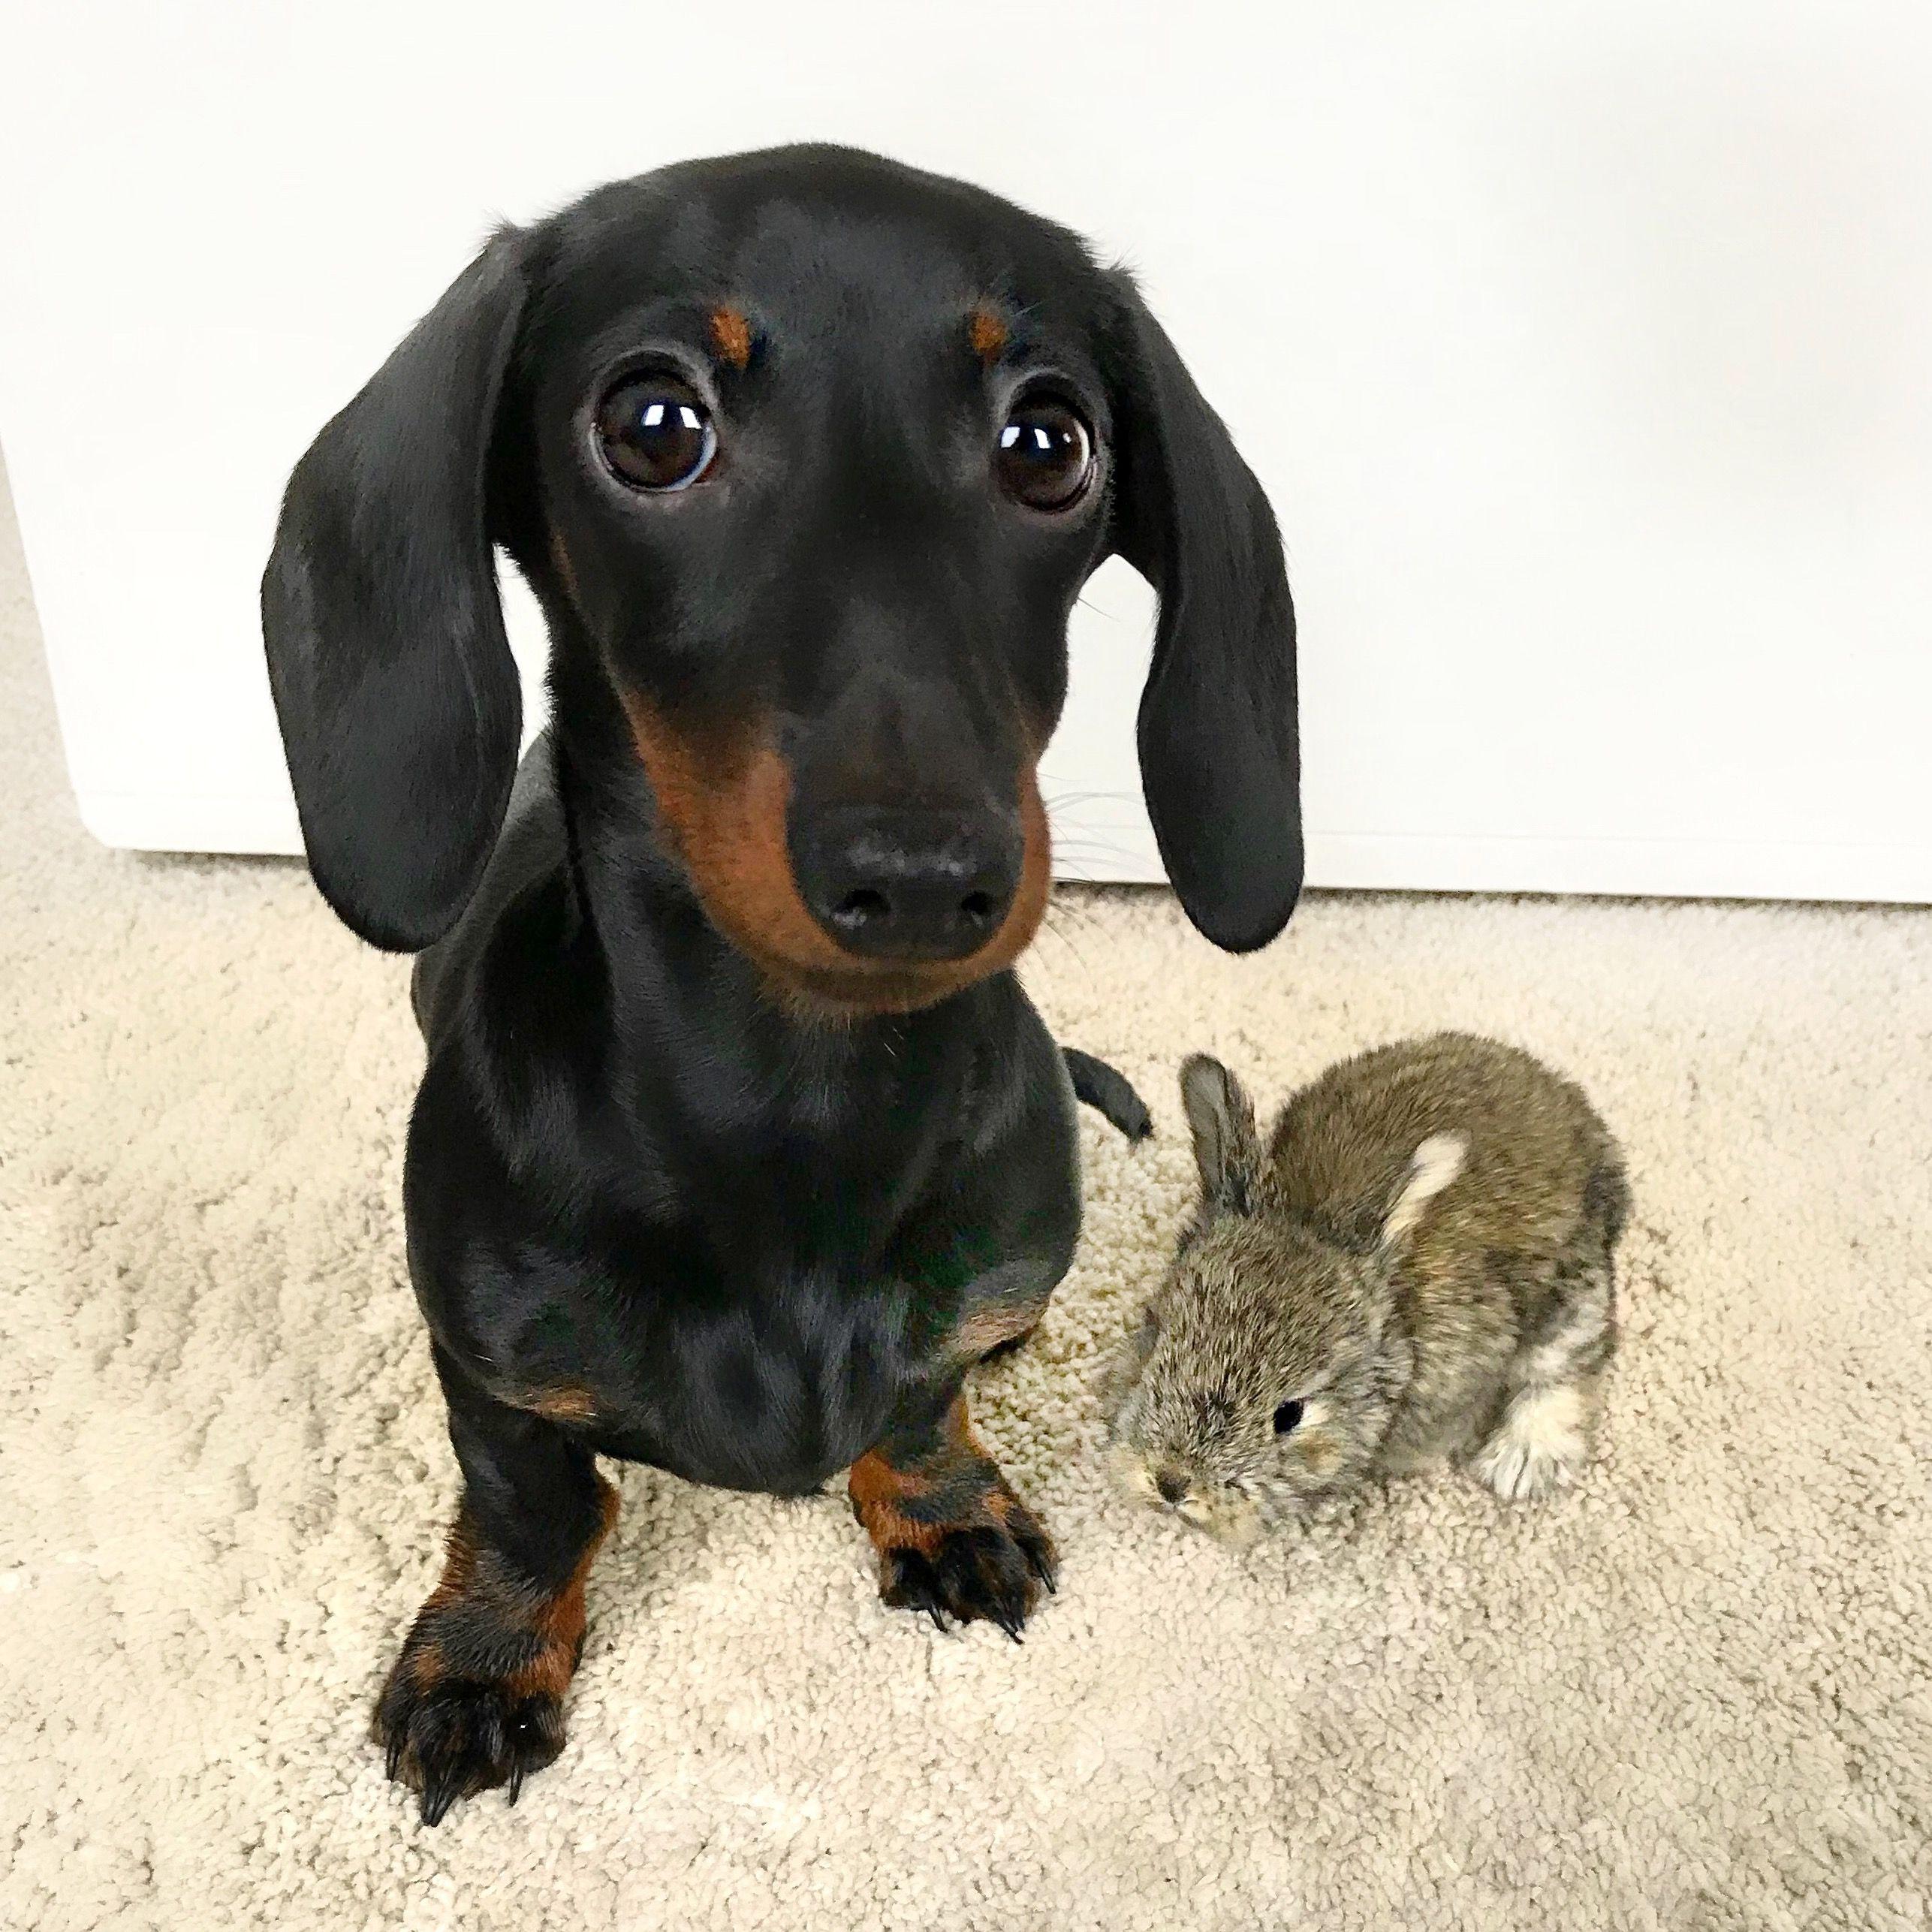 Loulou Bunny Weenie Dogs Dachshund Puppy Miniature Dachshund